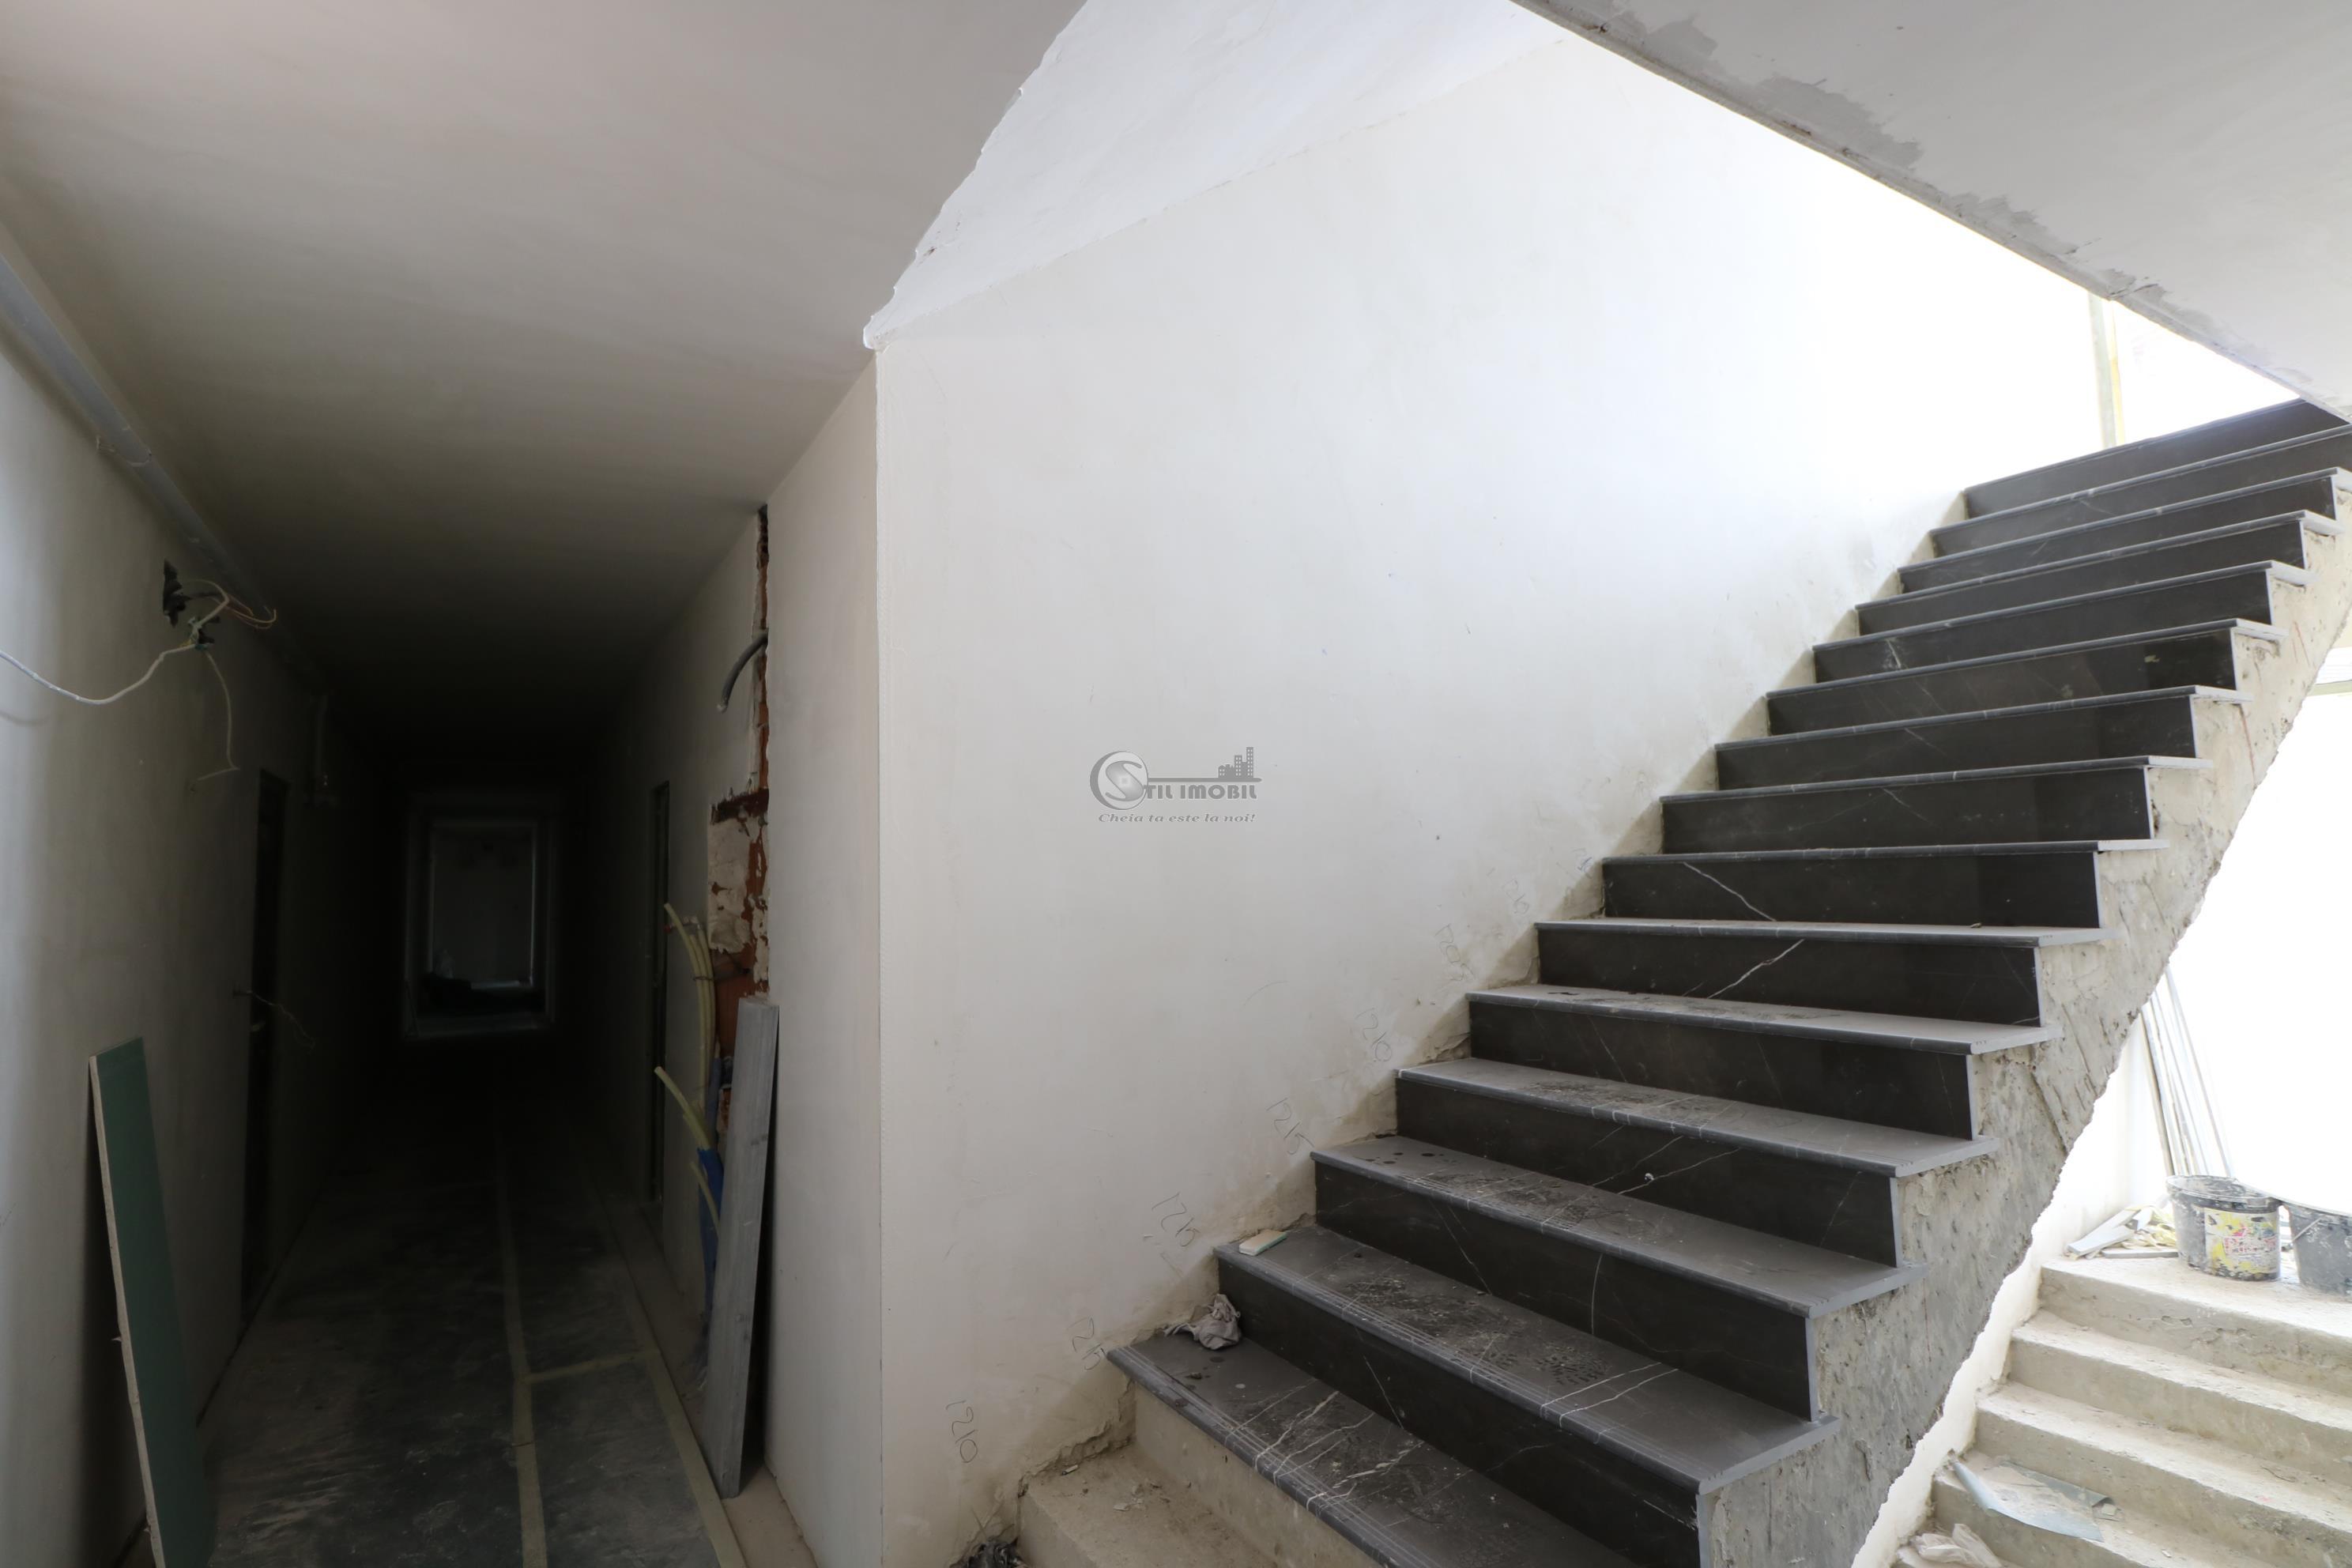 Apartament nou 1 camera, 34mp, Pacurari, 34400 Euro